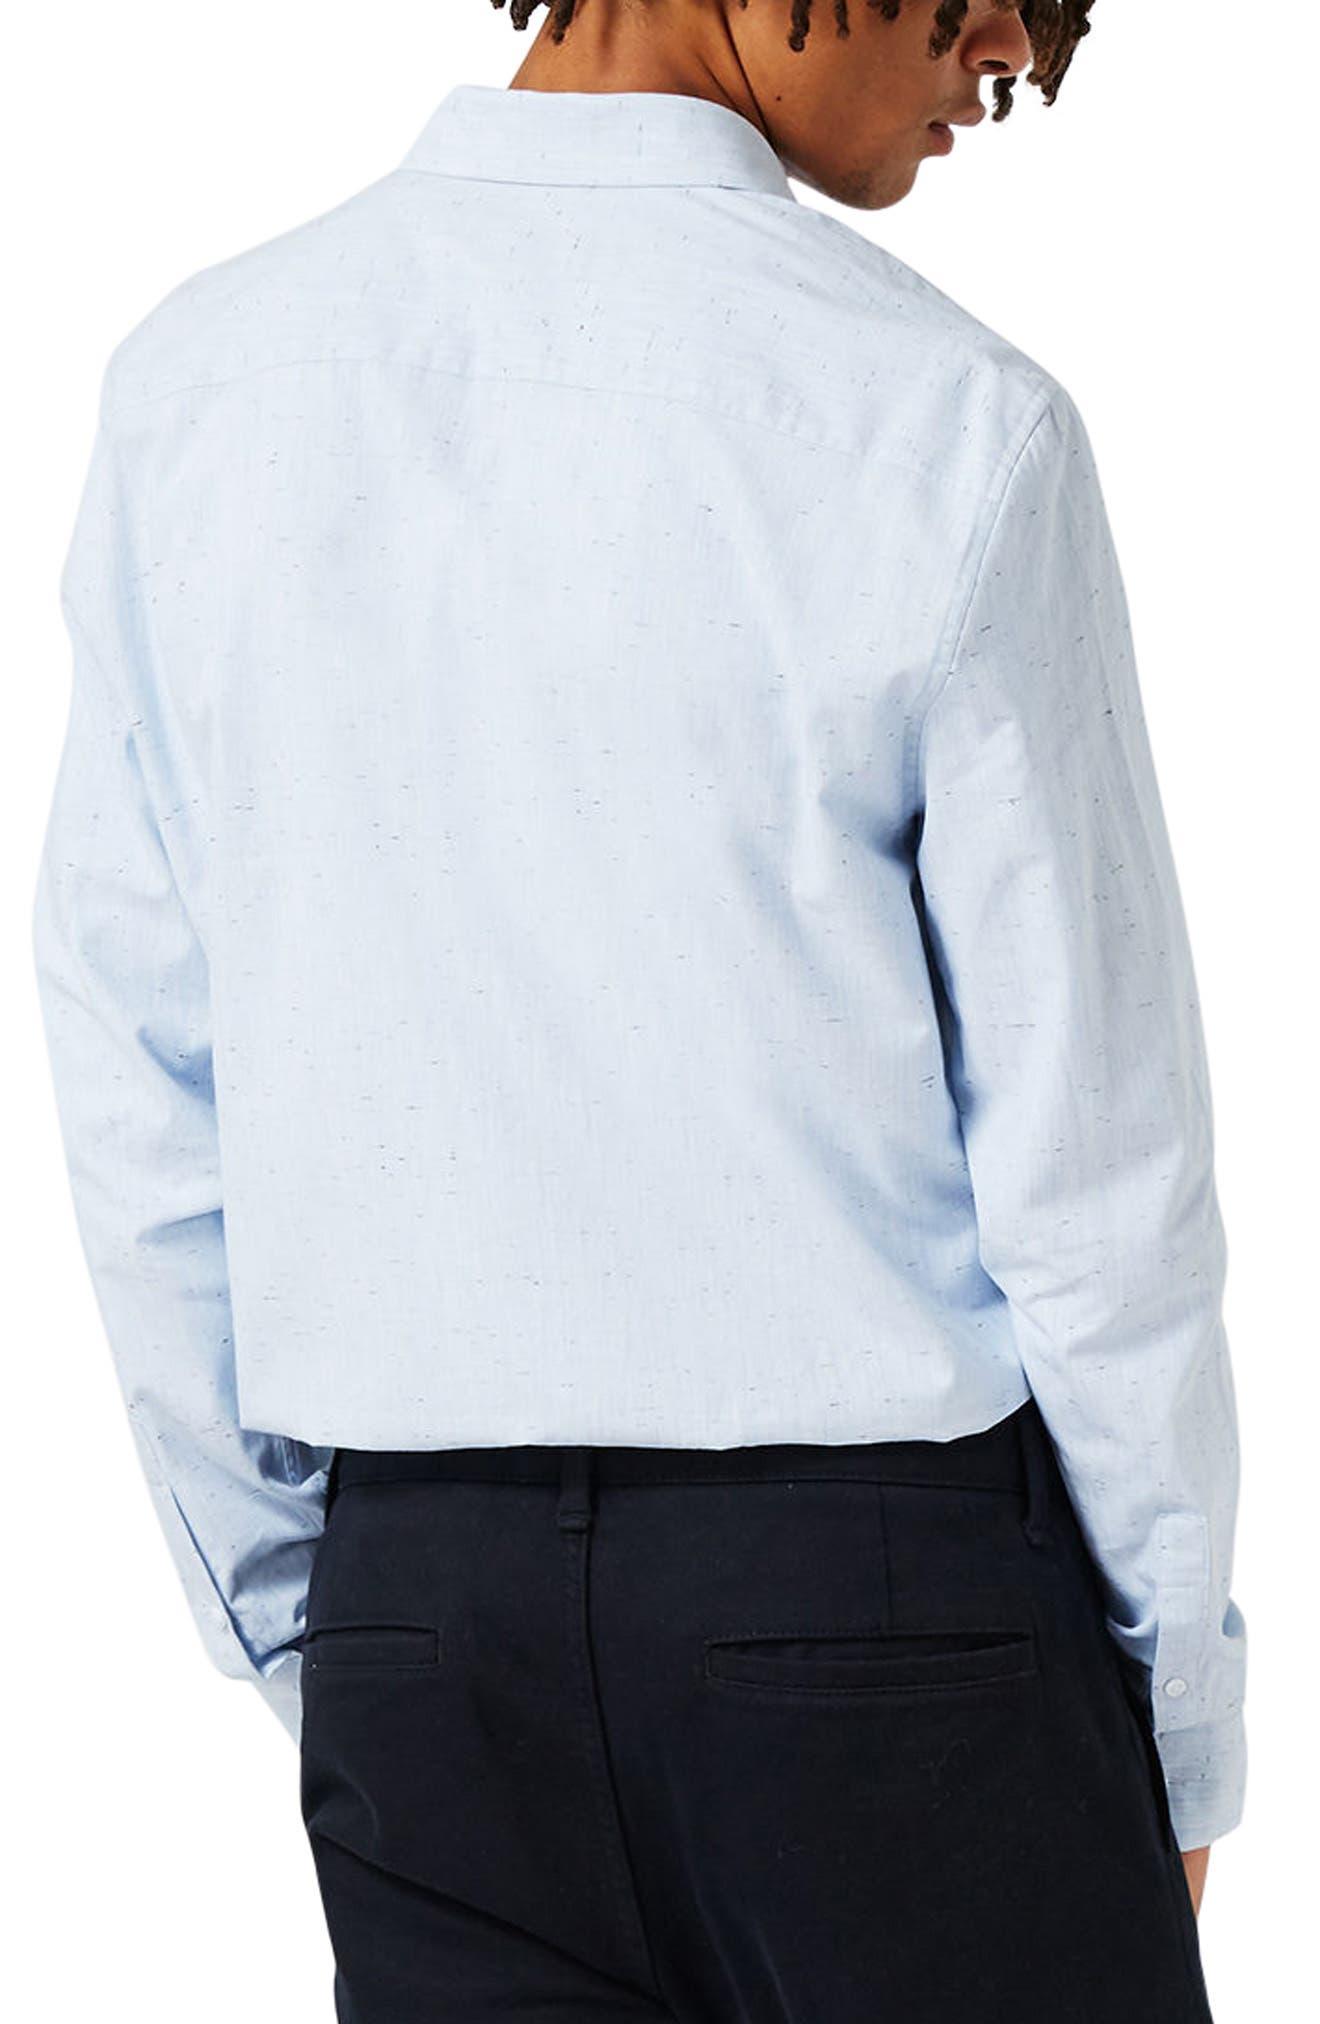 Slim Fit Nep Shirt,                             Alternate thumbnail 2, color,                             400